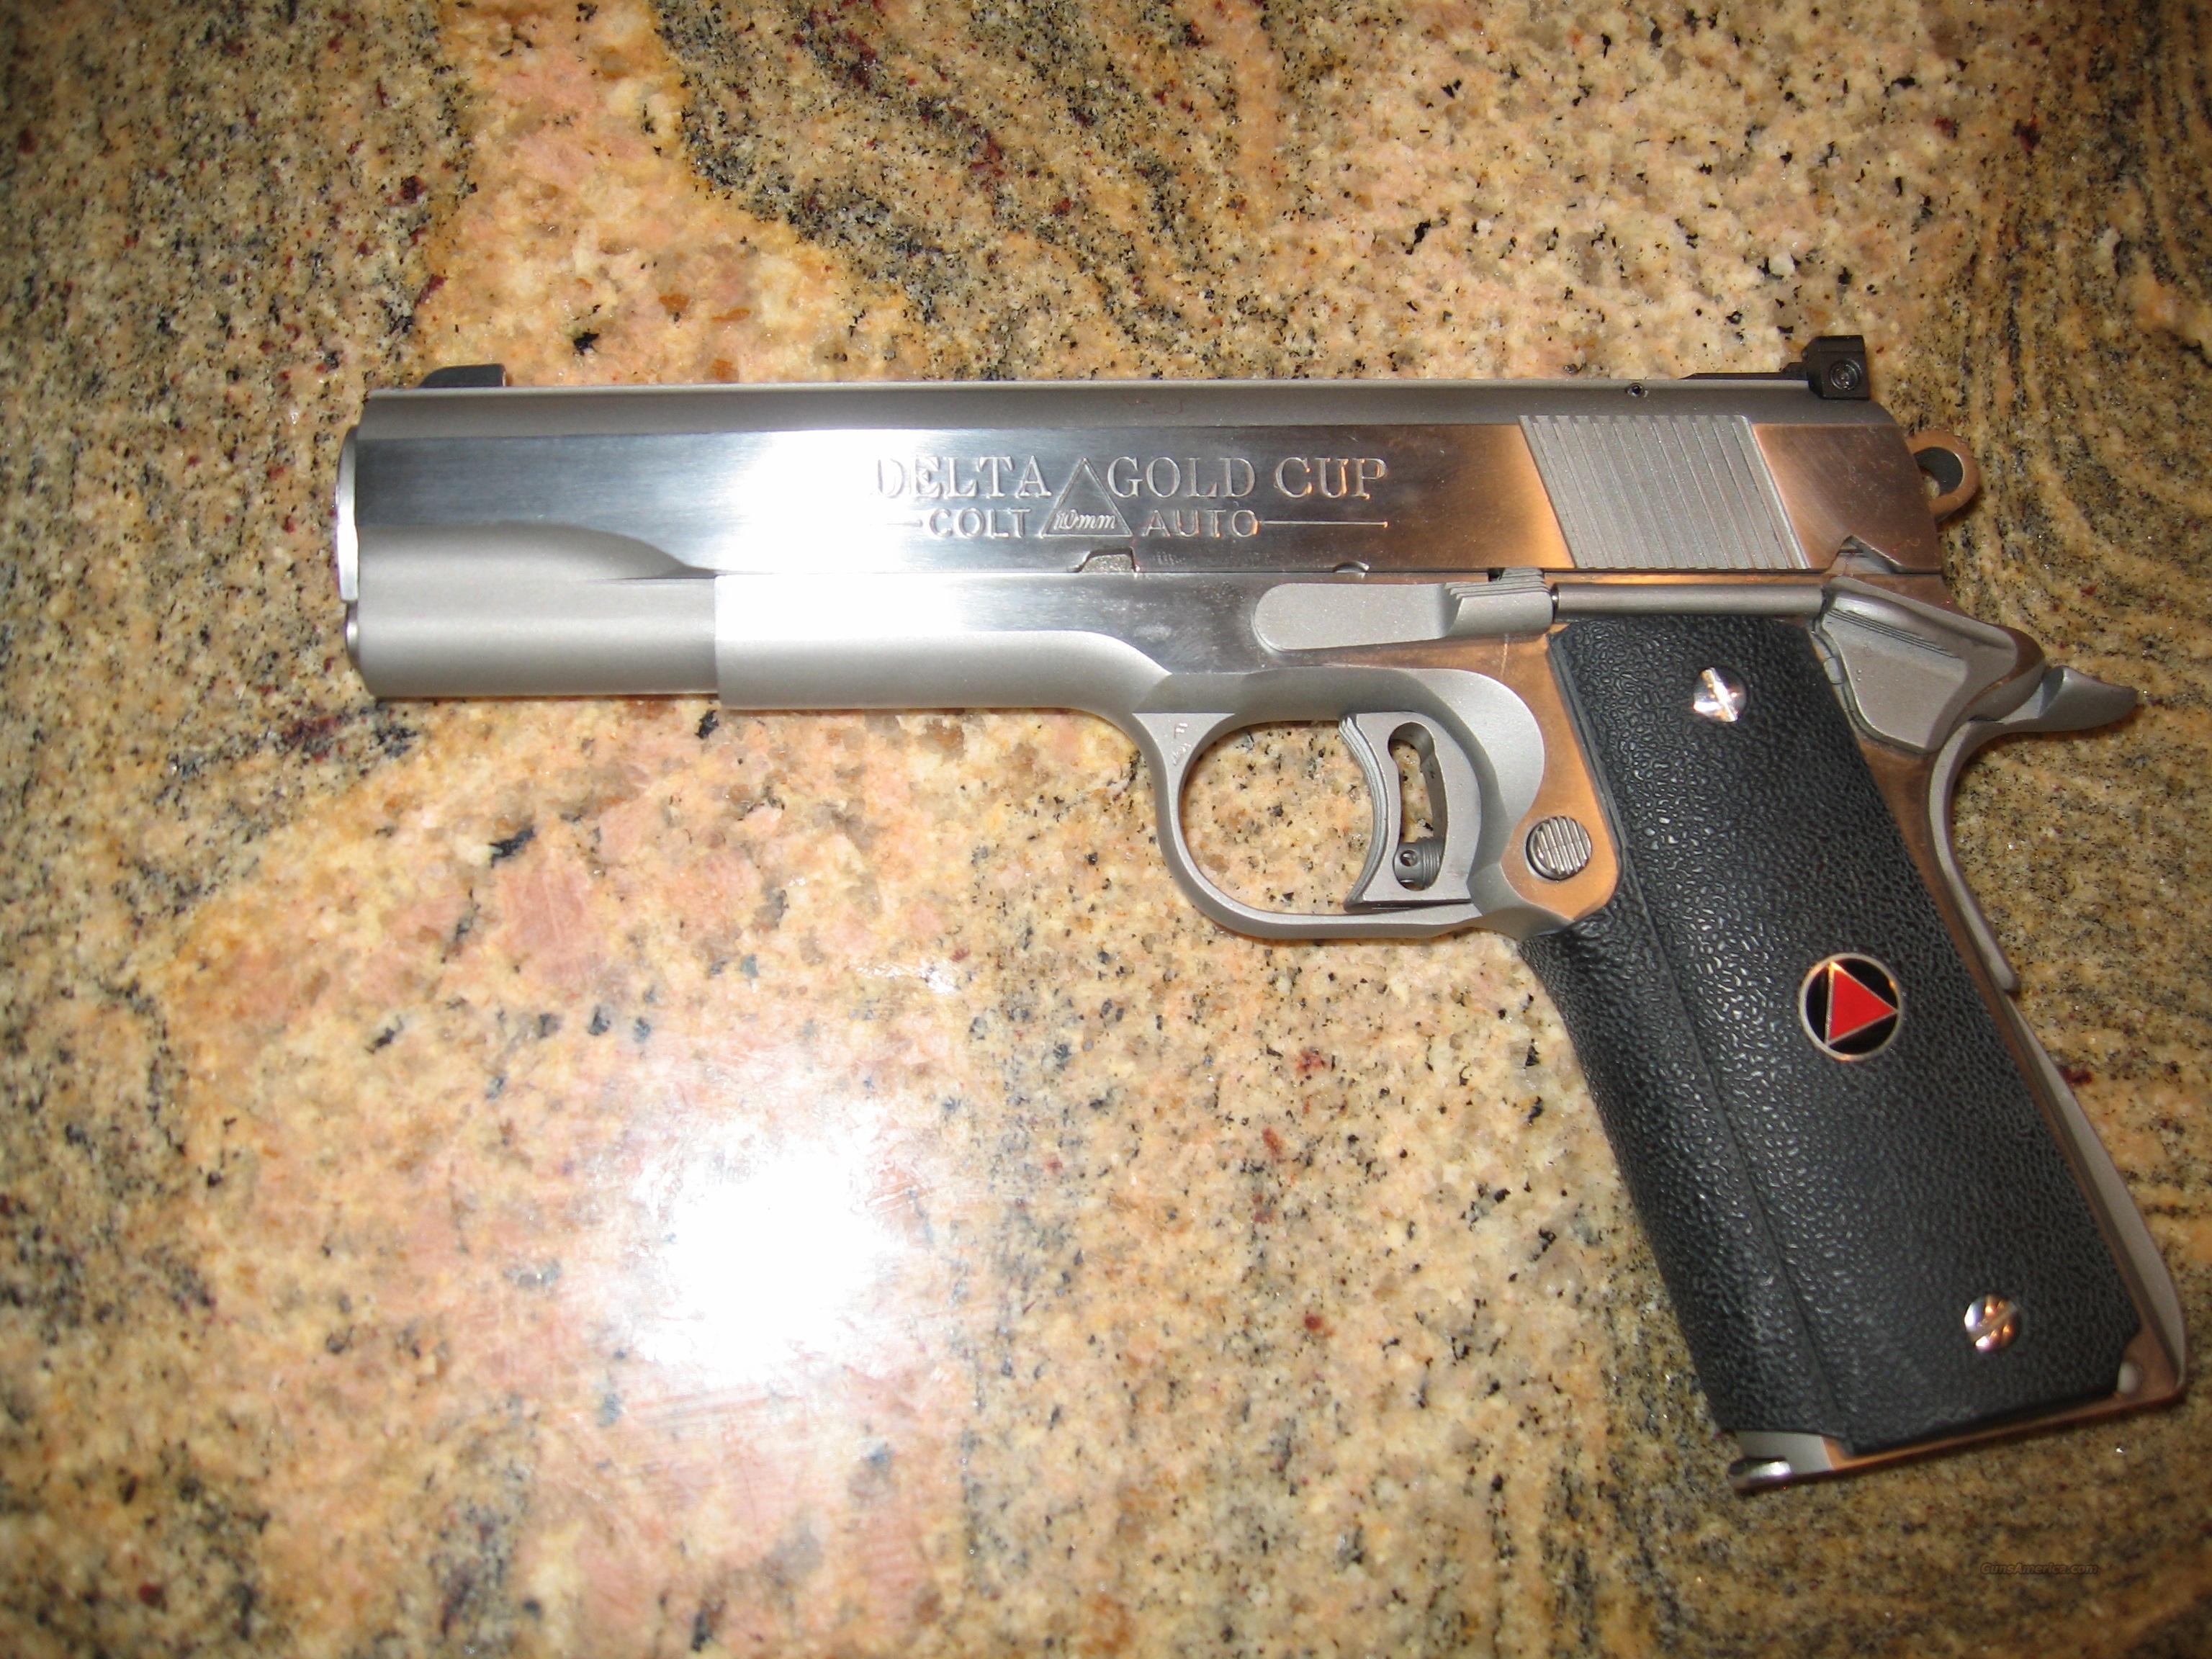 Colt 1911 Pistols 10mm Gold Cup Handgun Image Information Kimber Exploded View Diagram Lzk Gallery Delta En